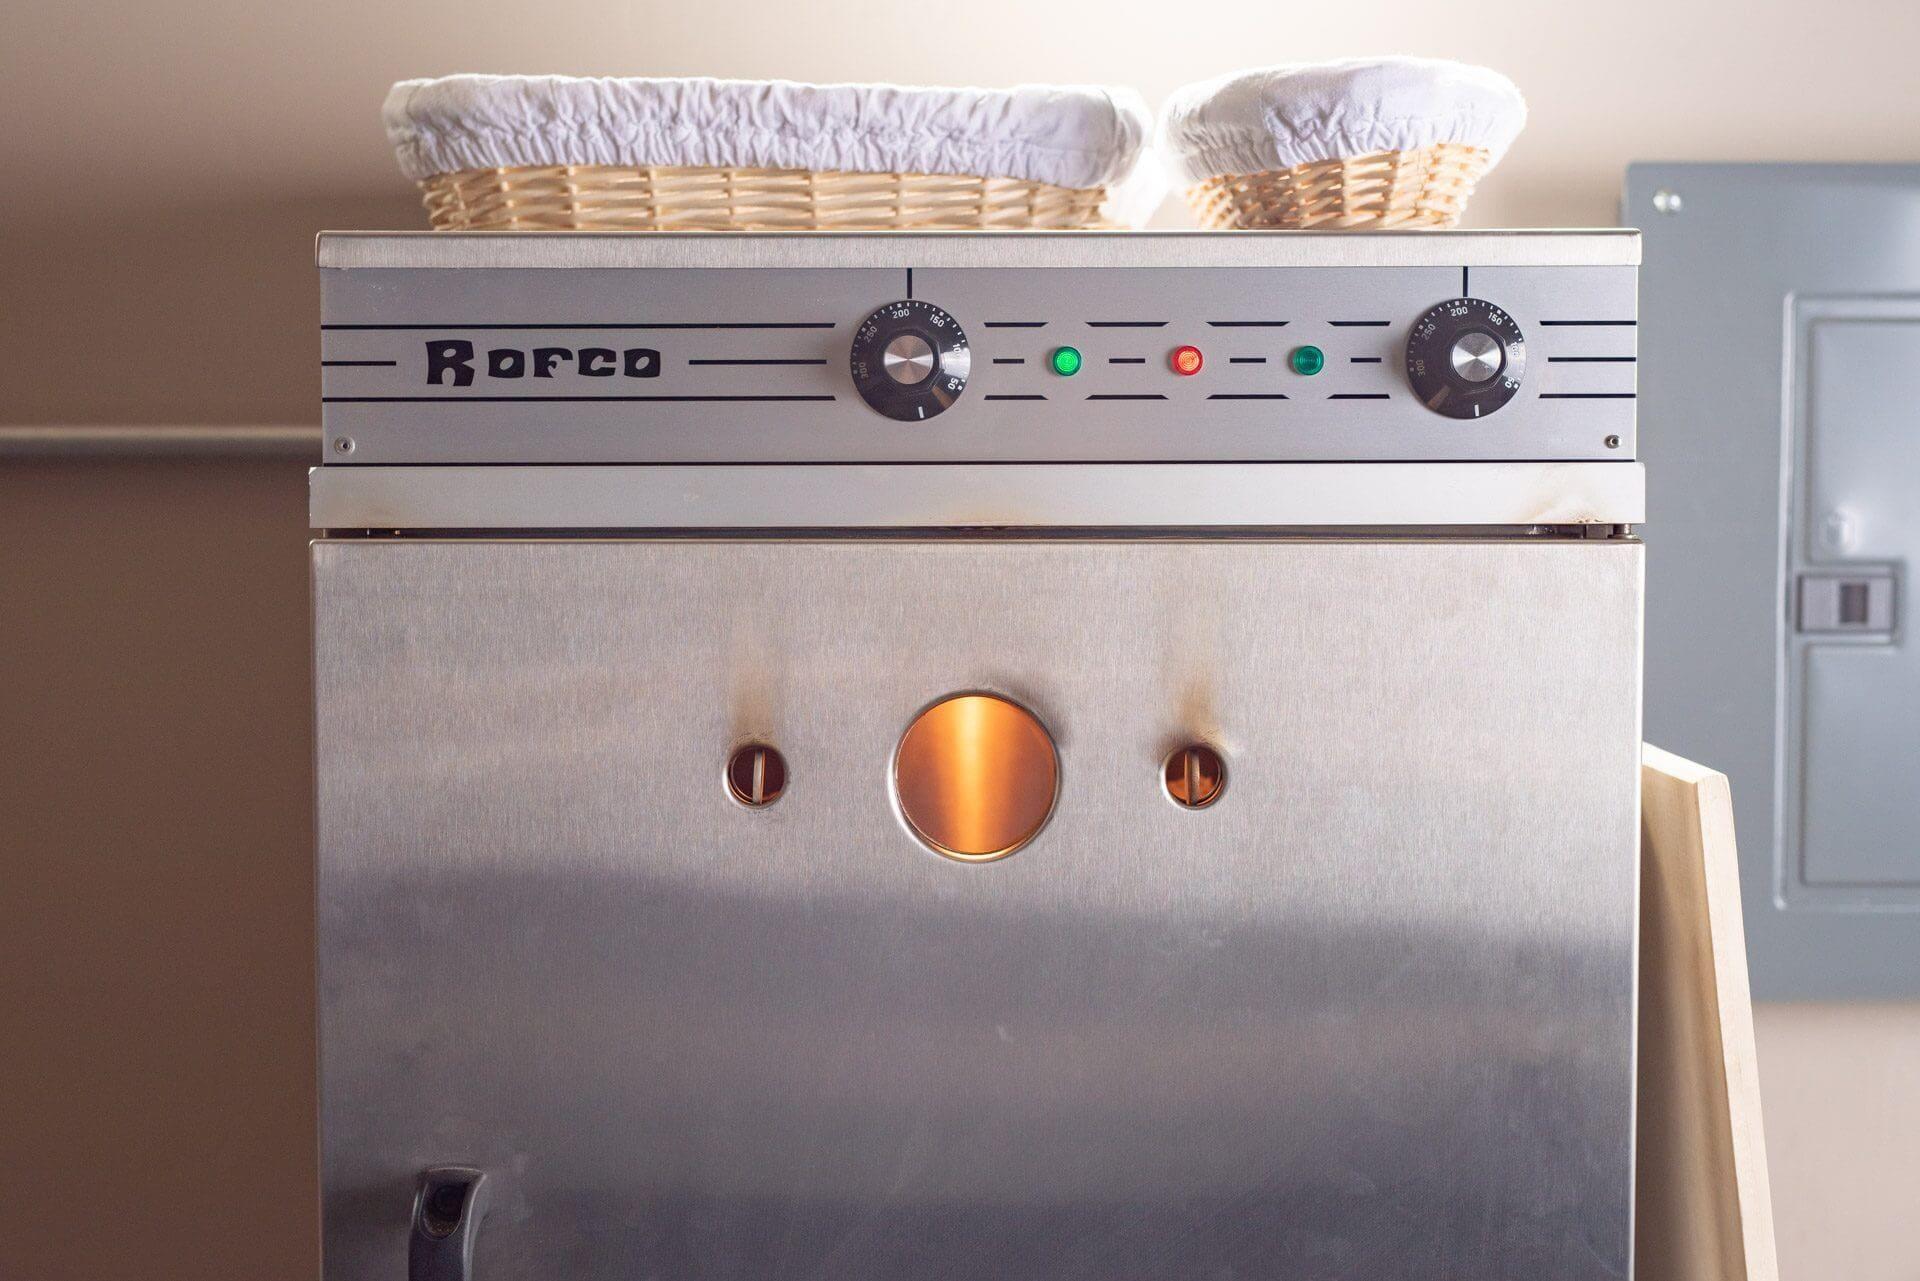 Baking bread in a Rofco B40 Bread Oven